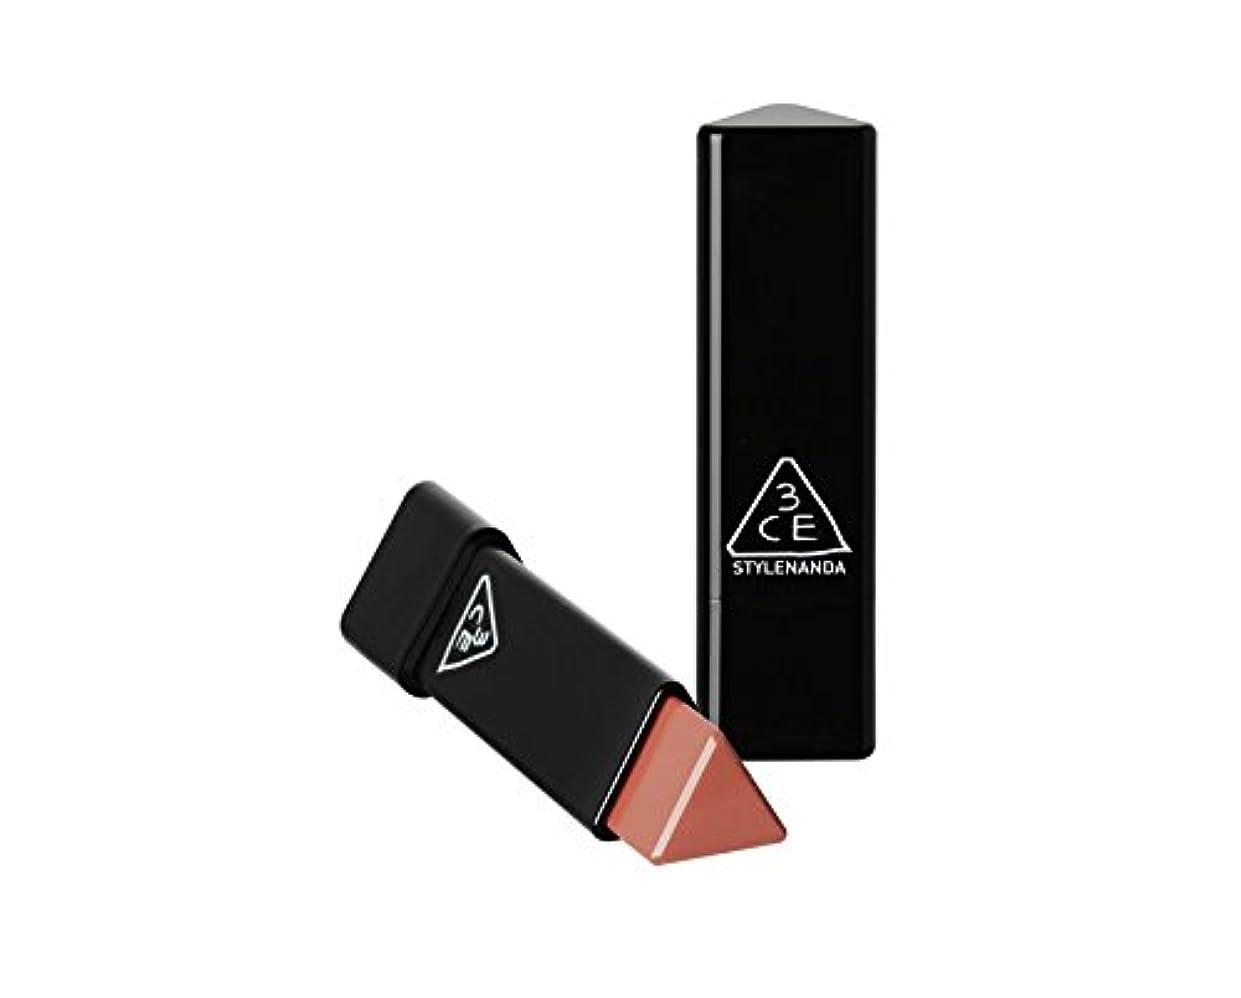 信条シャーク適応的3CE スロージャム三角形口紅 3 Concept Eyes Style Nanda Glow Jam Stick Triangle Lipstick (正品?海外直送品) (Very Berry)